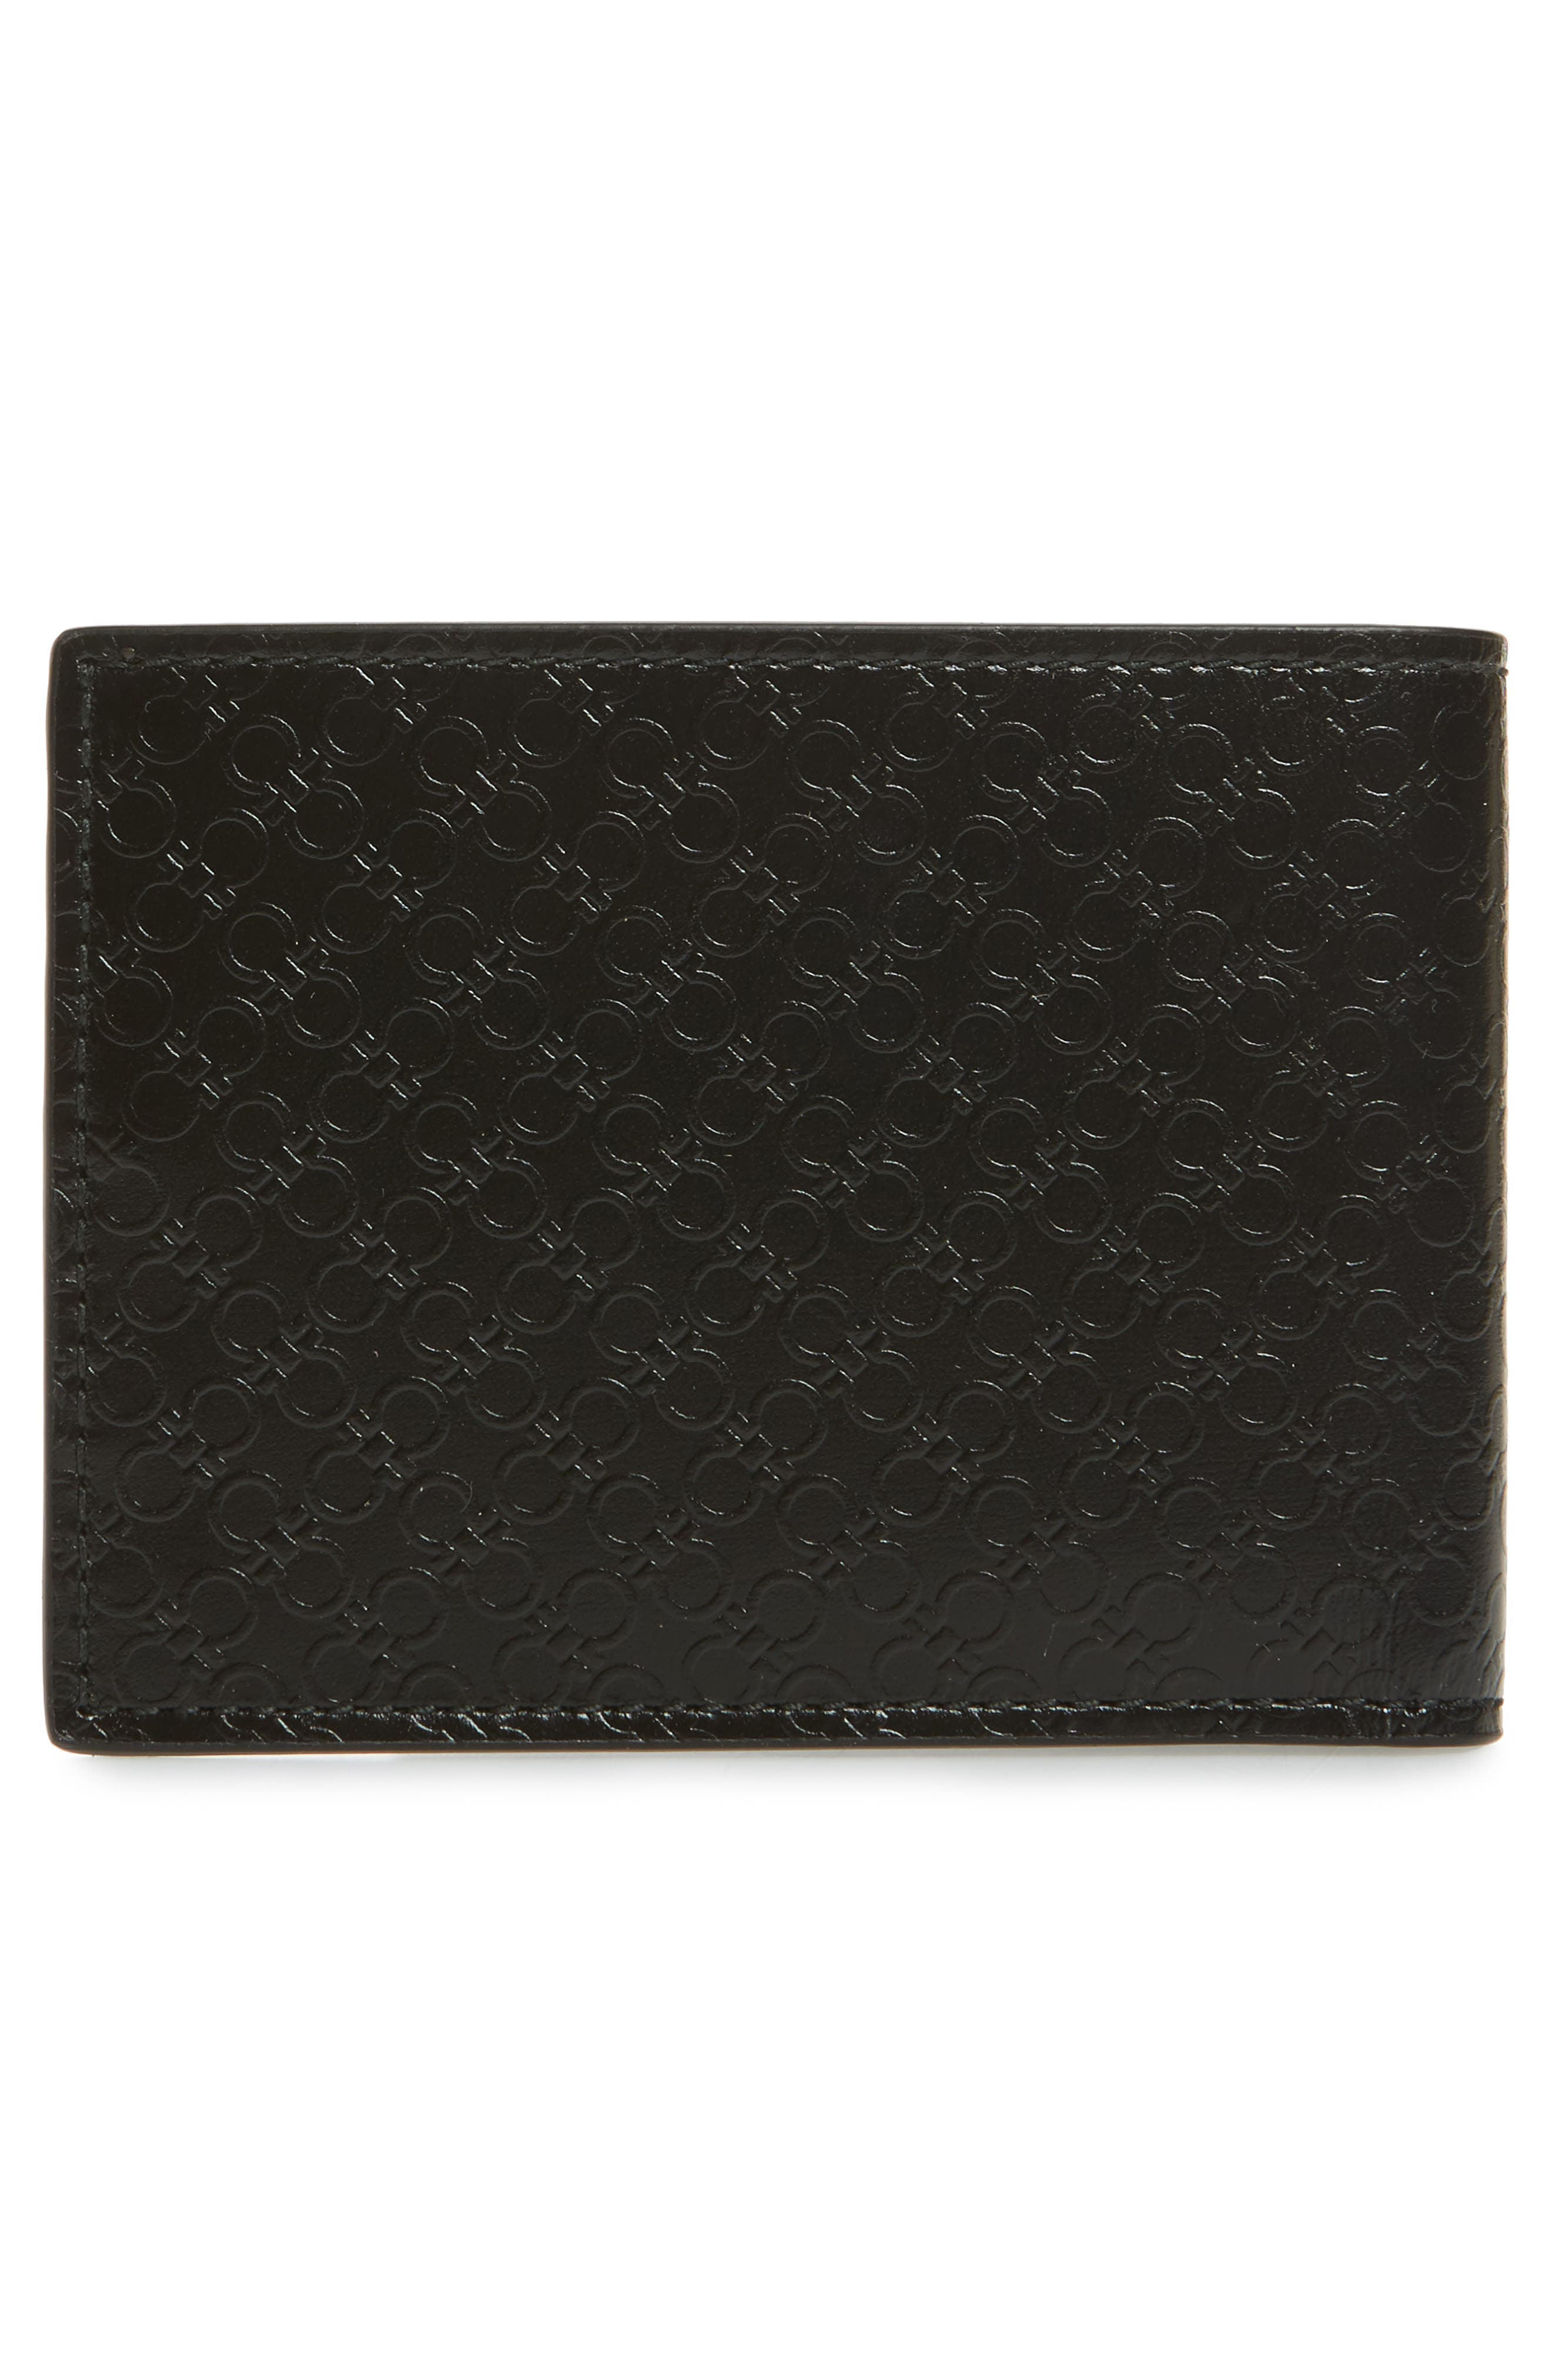 Alternate Image 2  - Salvatore Ferragamo Gancini Leather Card Case